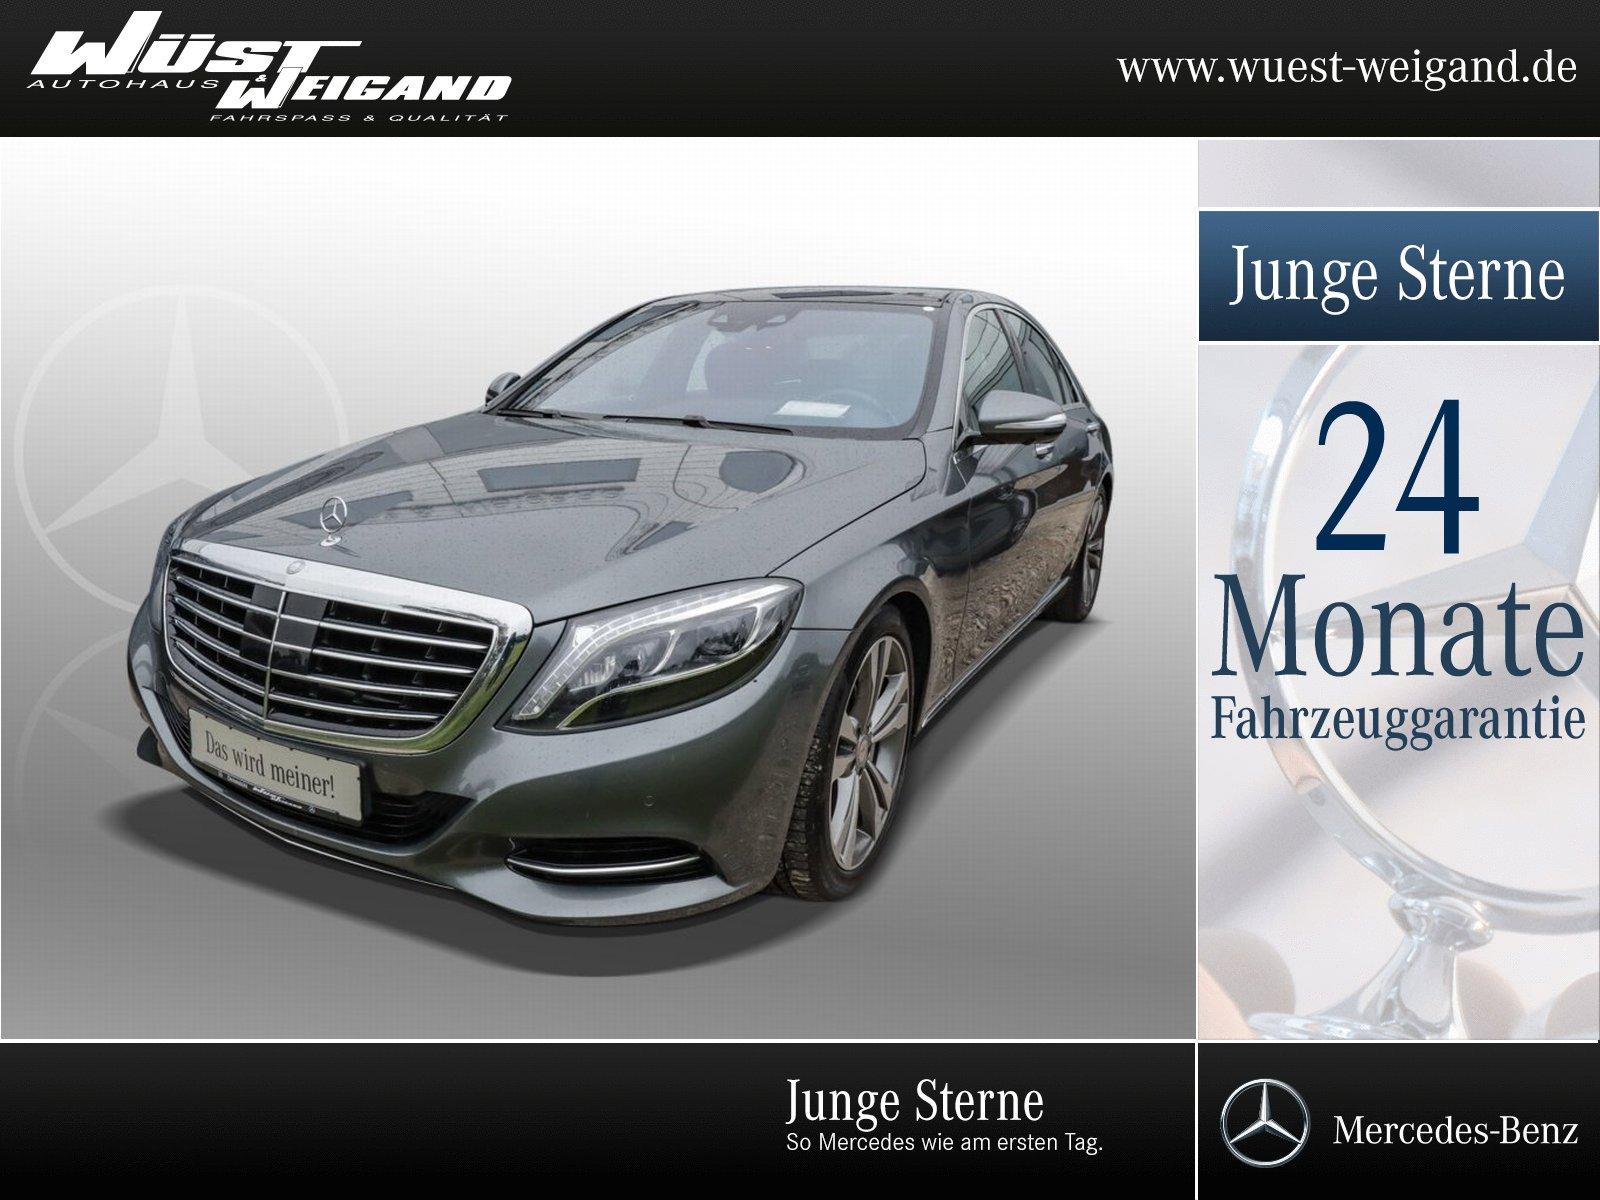 Mercedes-Benz S 400 4M Klima+Navi+LED+Pano.Dach+Memory+PTS, Jahr 2017, Benzin